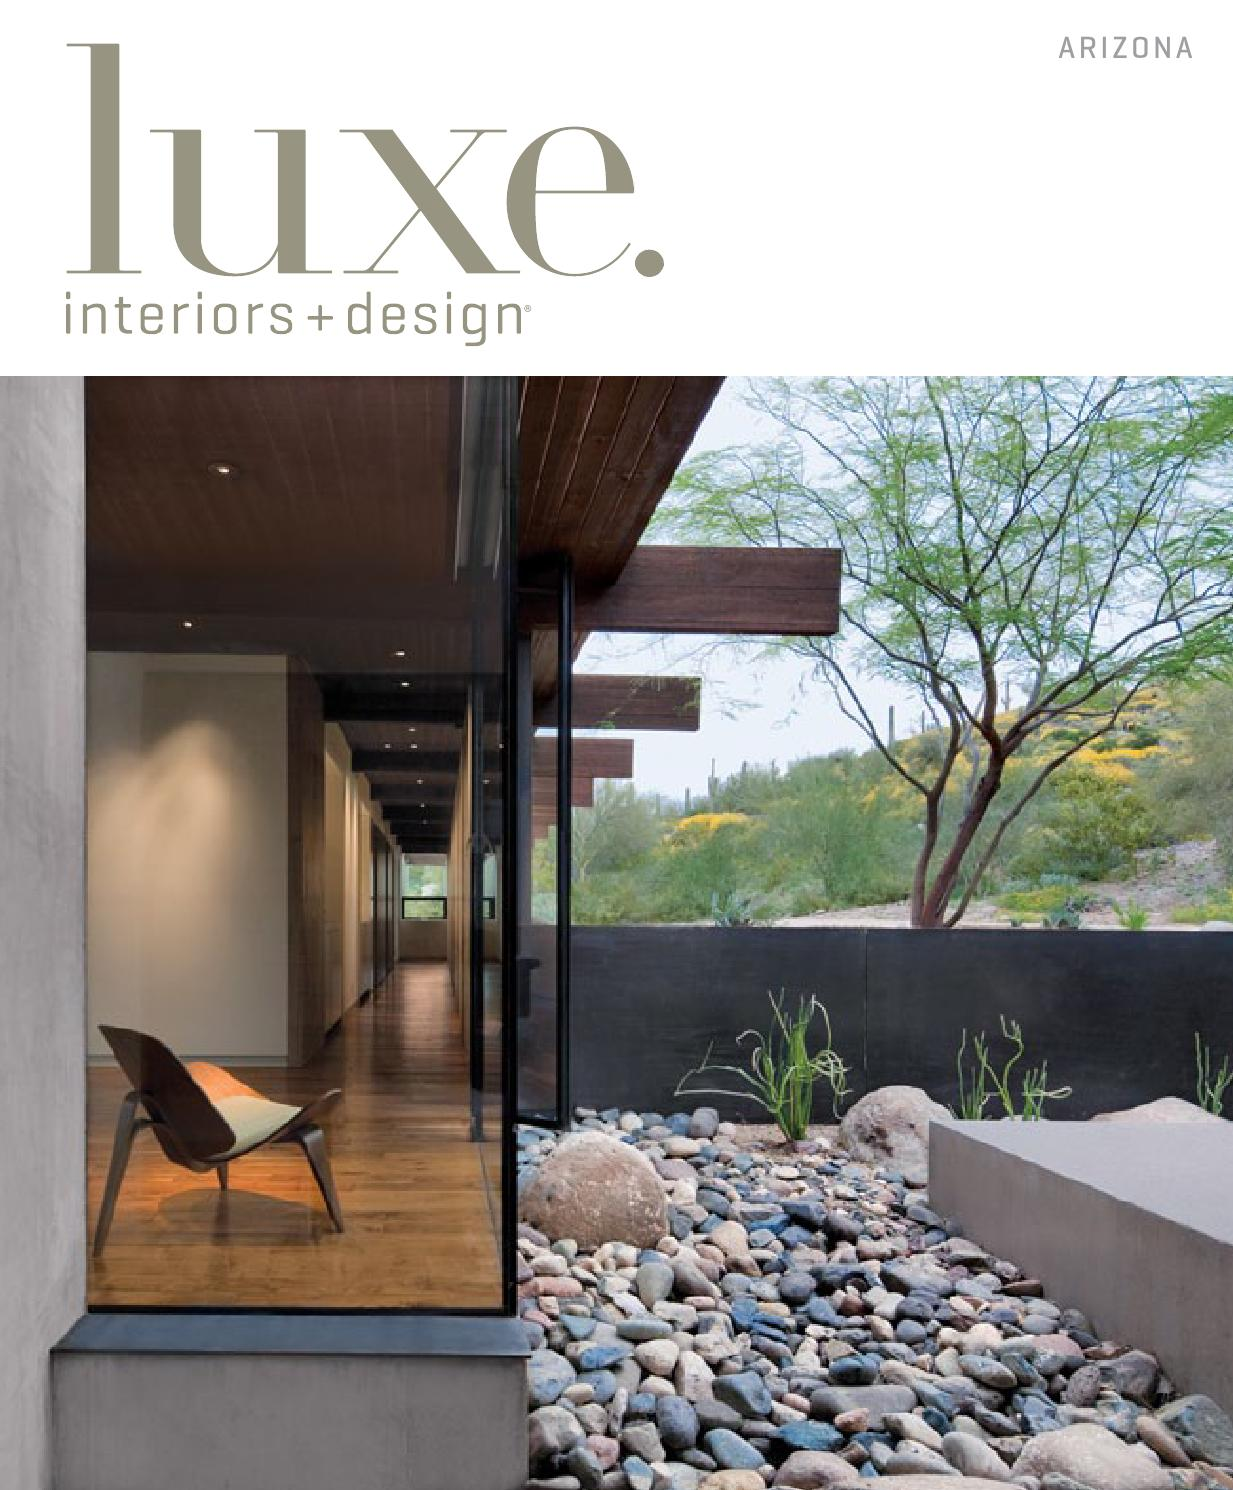 Luxe Interiors + Design Magazine - Arizona   May 2013